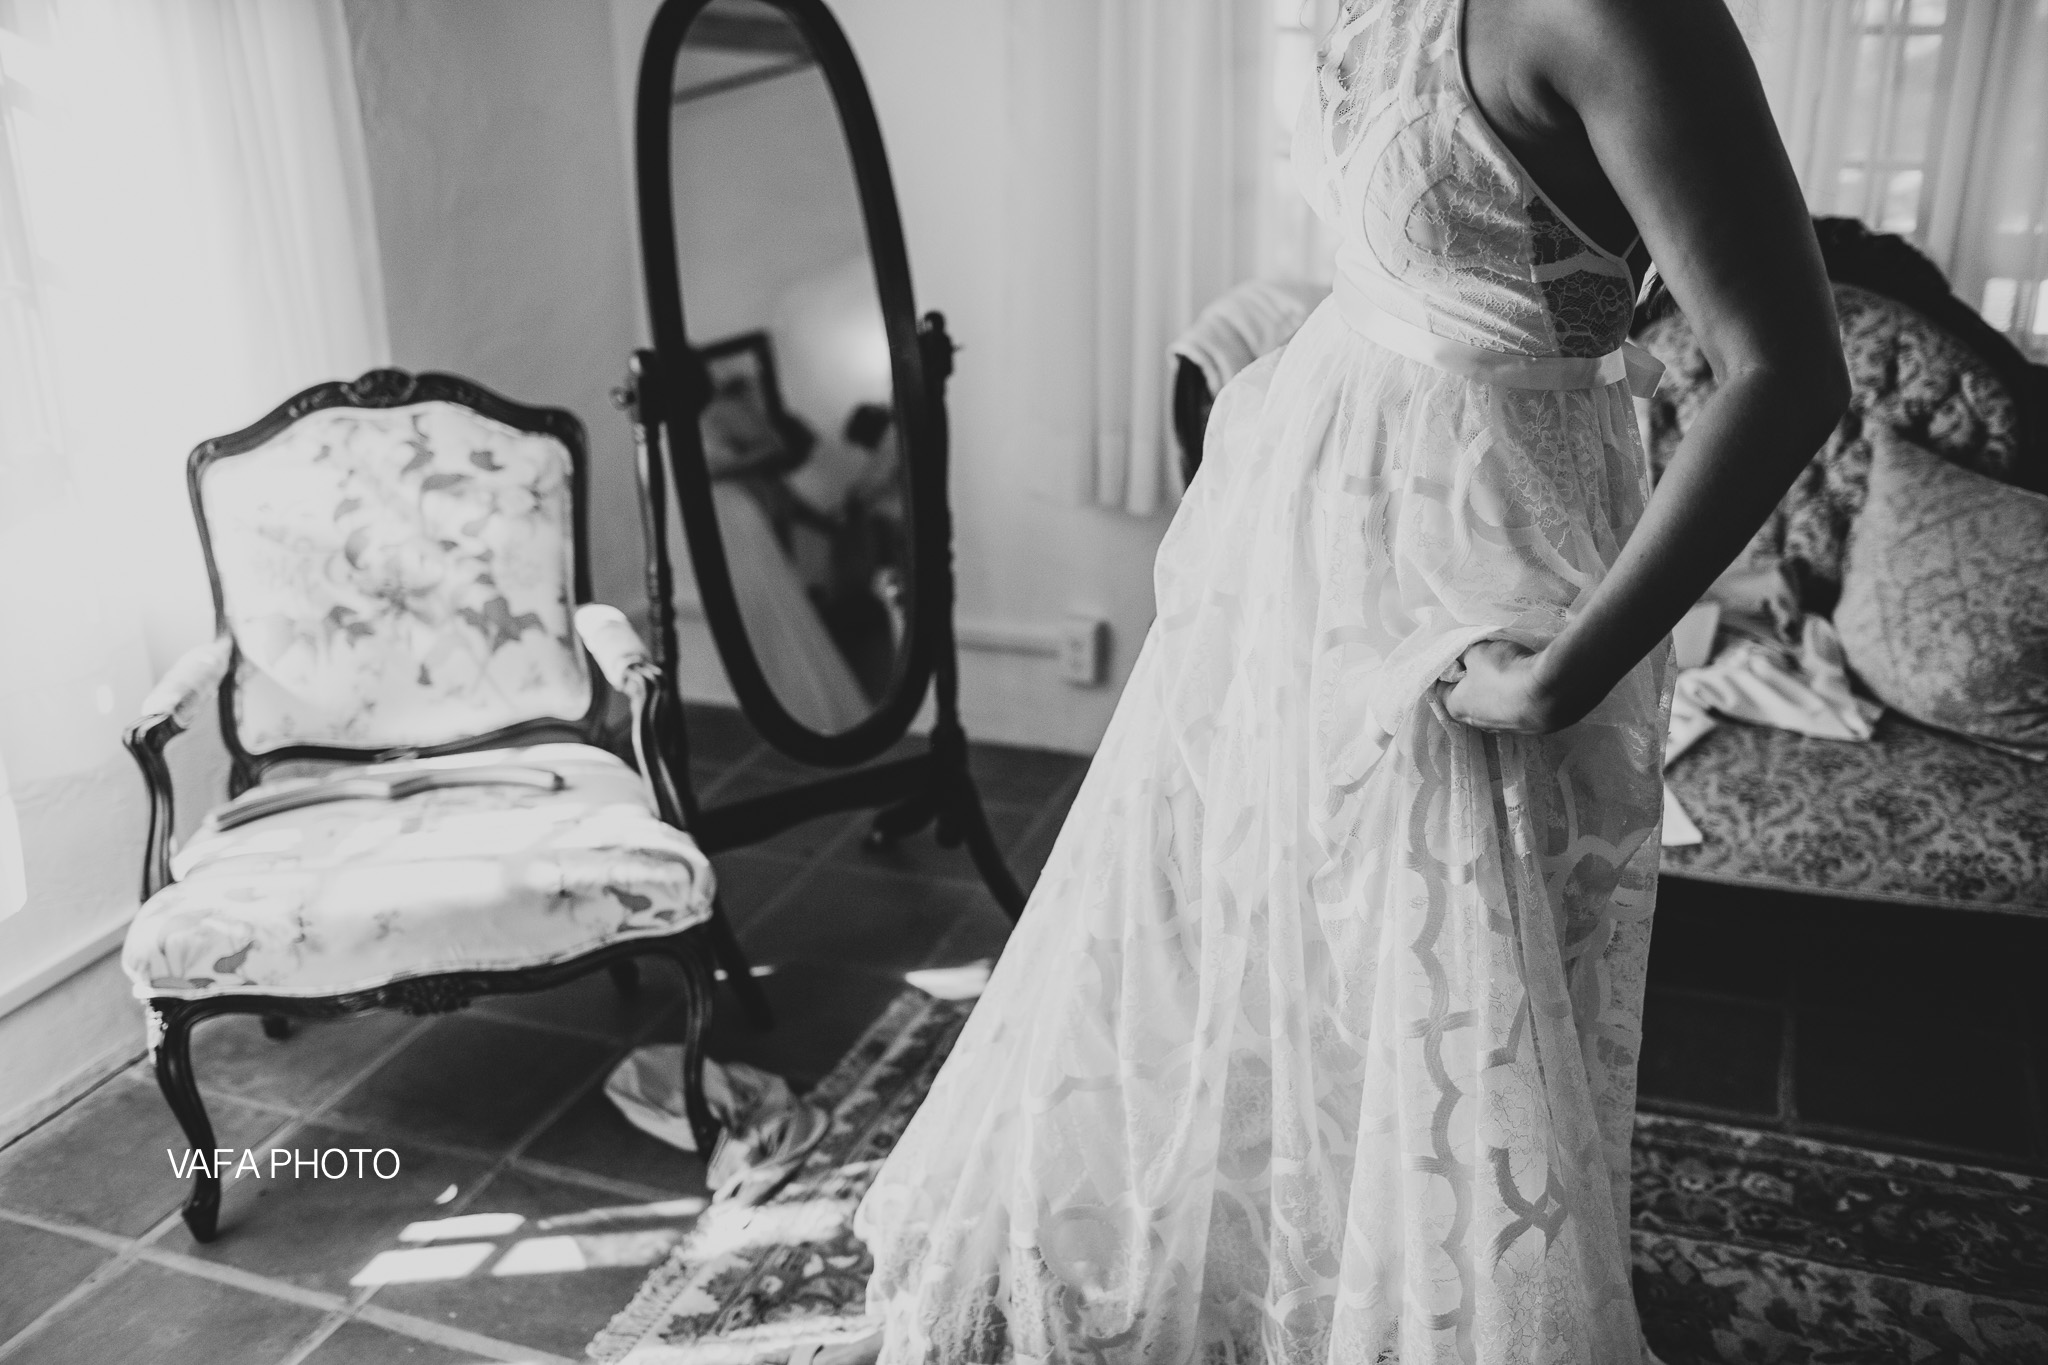 Leo-Carrillo-Ranch-Wedding-Lauren-Mike-Vafa-Photo-144.jpg